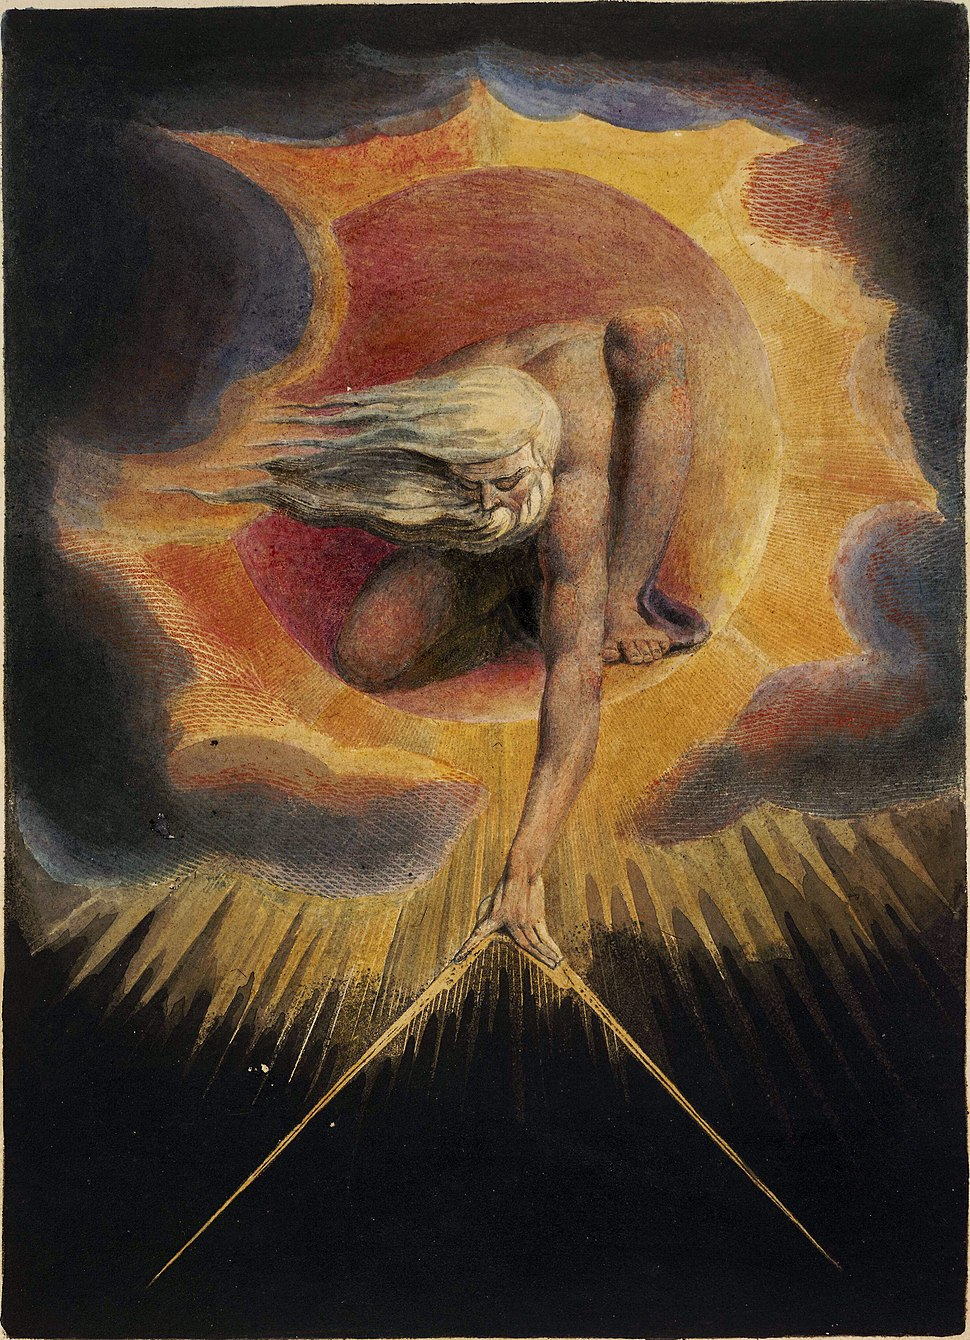 Europe a Prophecy, copy D, object 1 (Bentley 1, Erdman i, Keynes i) British Museum